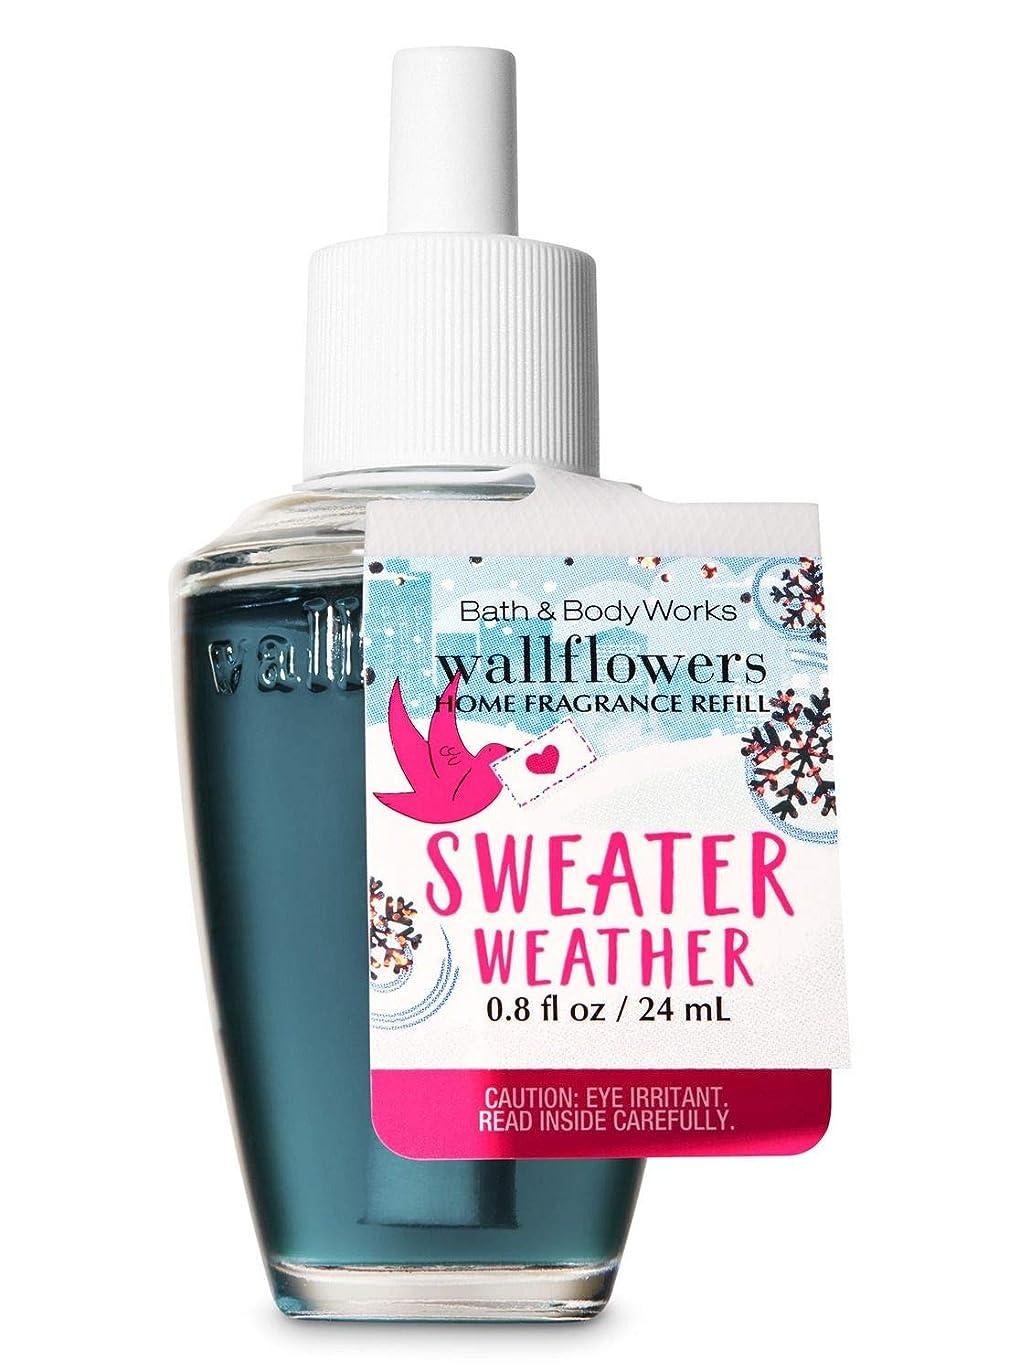 【Bath&Body Works/バス&ボディワークス】 ルームフレグランス 詰替えリフィル スウェターウェザー Wallflowers Home Fragrance Refill Sweater Weather [並行輸入品]